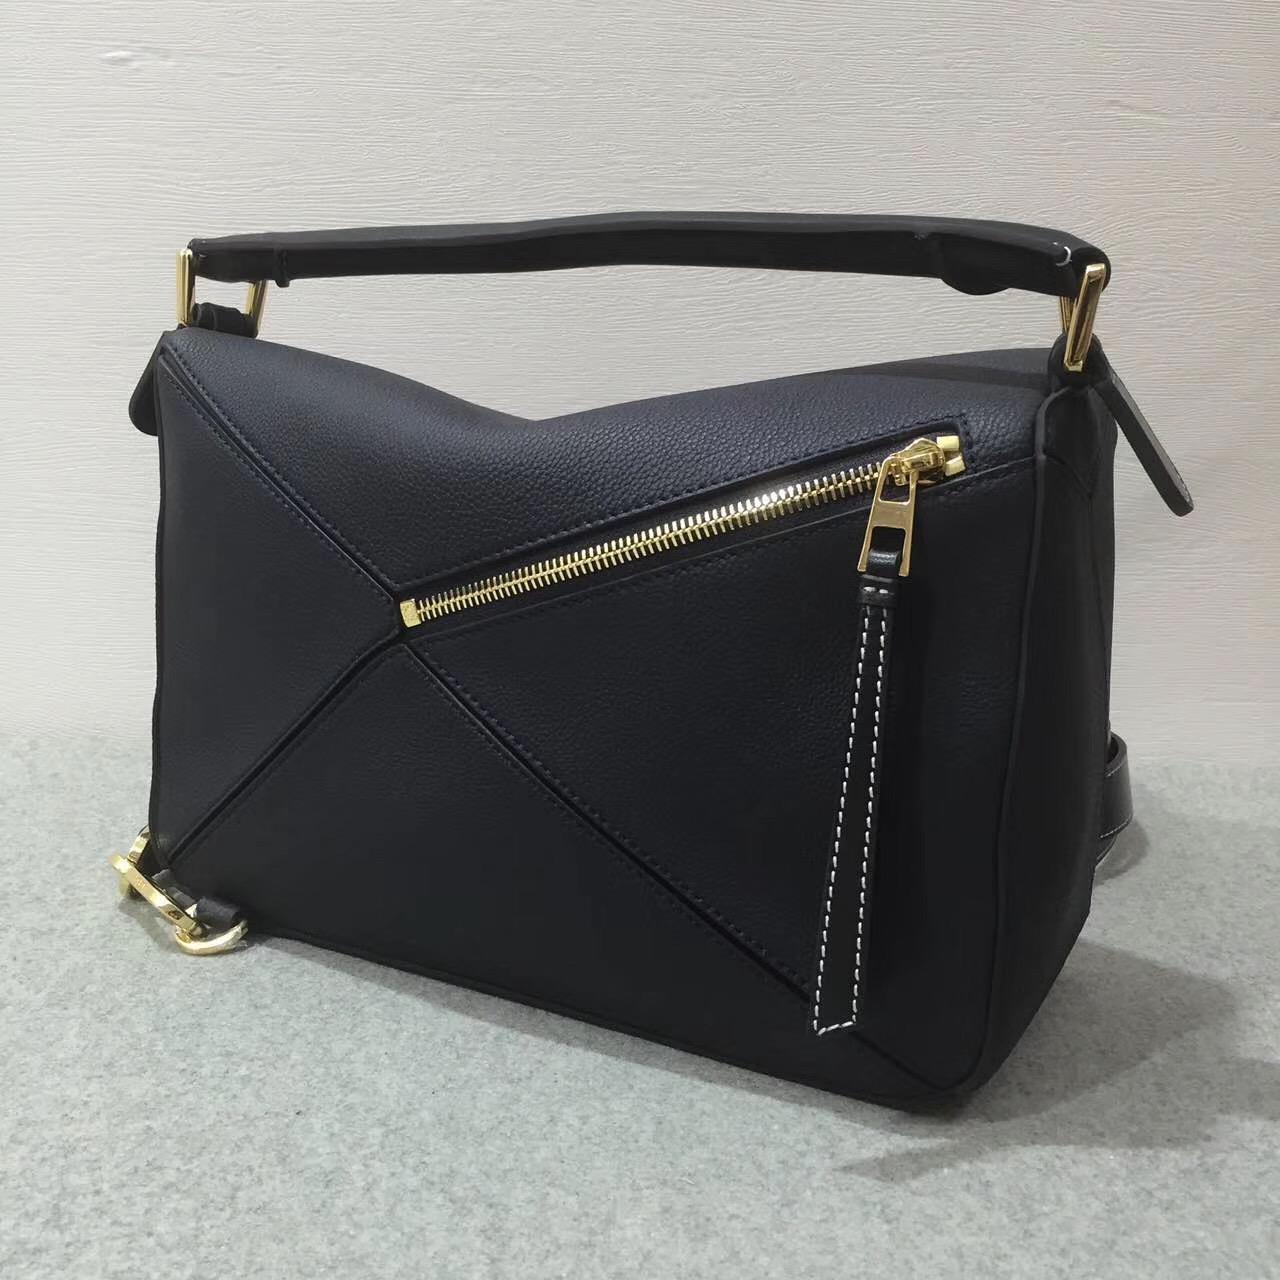 Loewe羅意威中號 Puzzle Bag 顆粒小牛皮黑蓝色